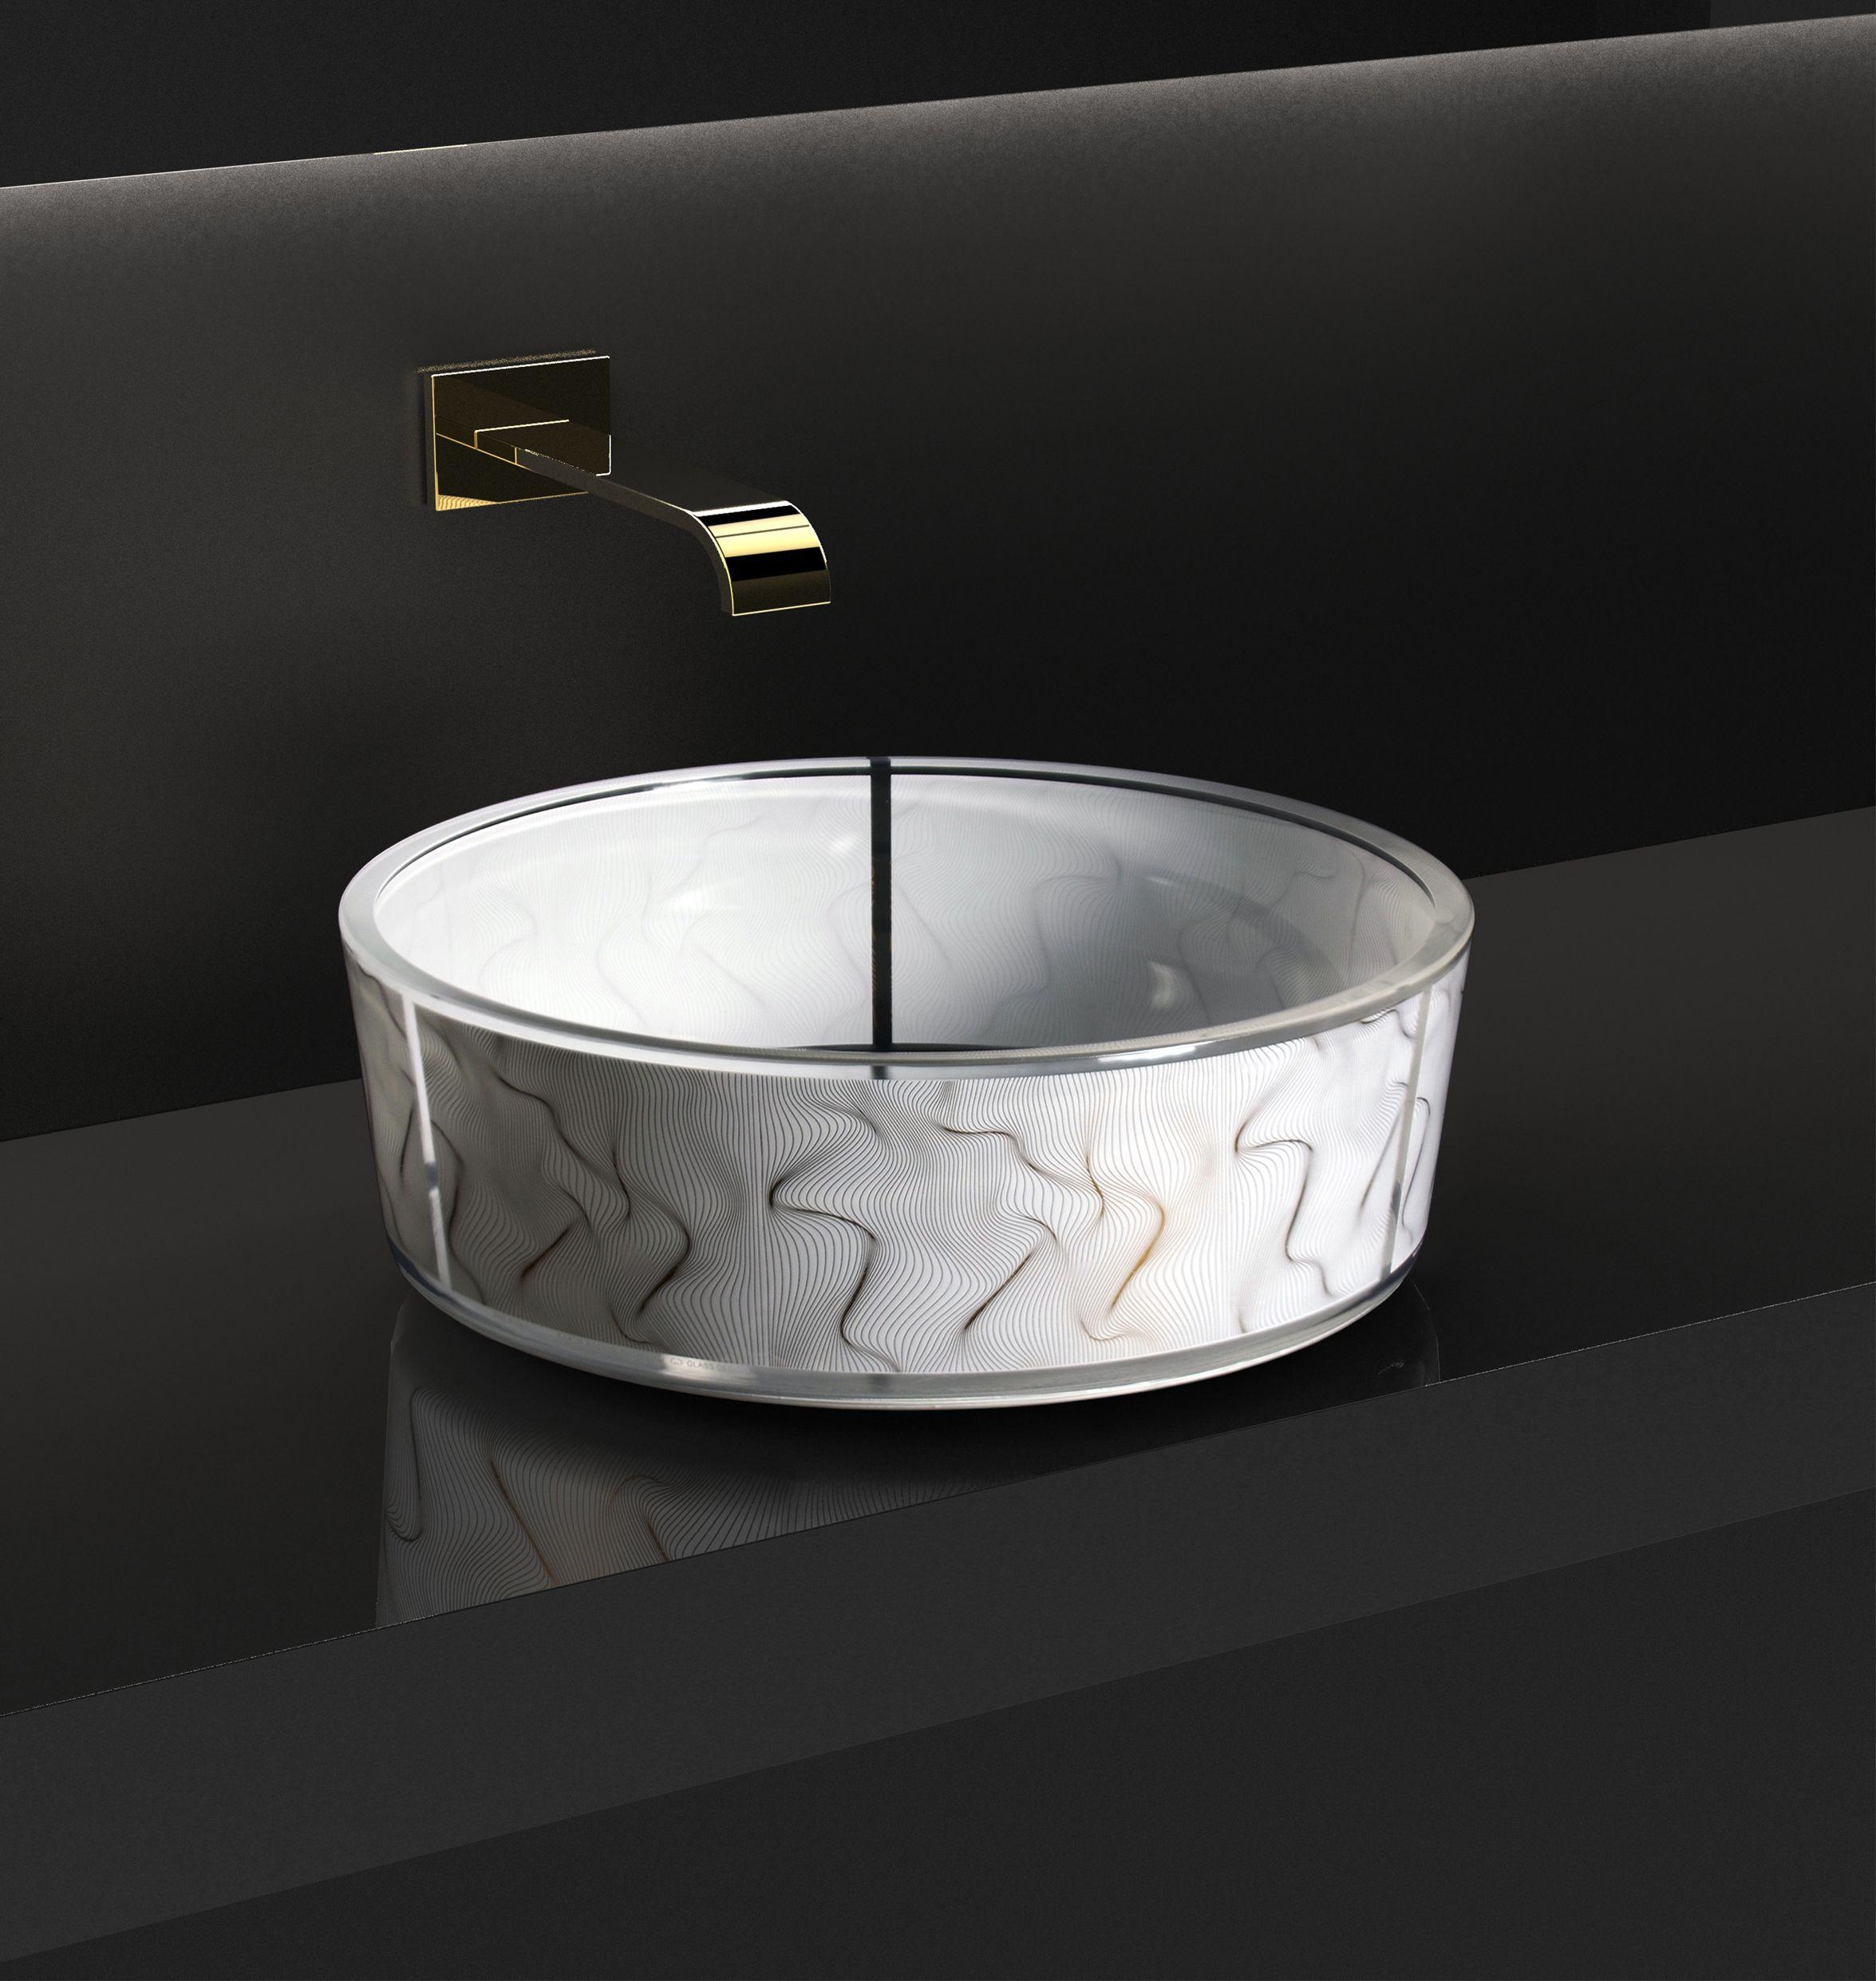 Umywalka Vento marki Glass Design